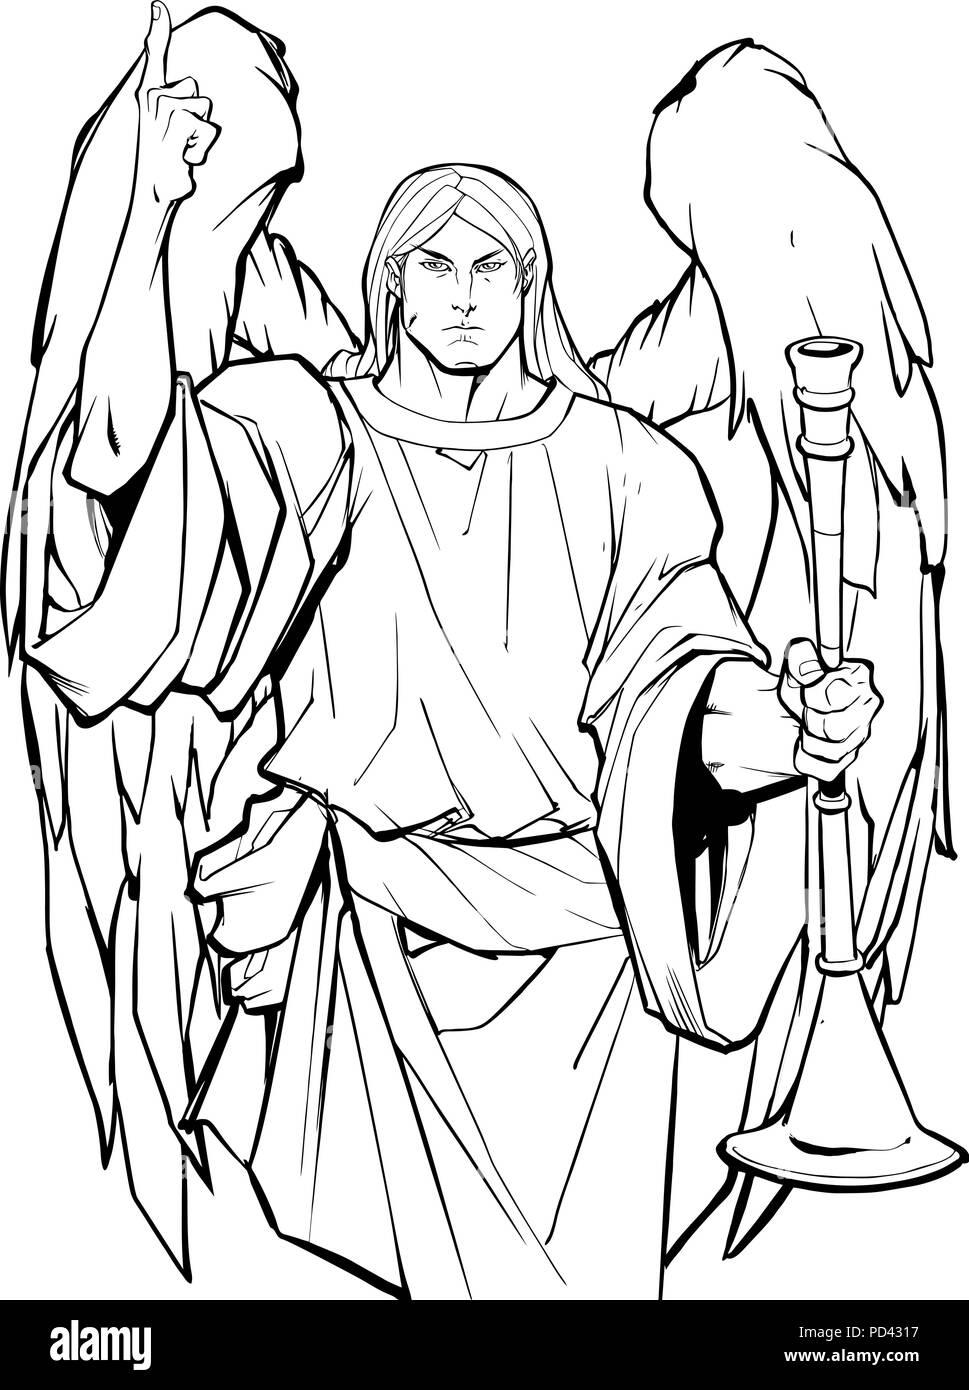 Archangel Gabriel Line Art - Stock Image